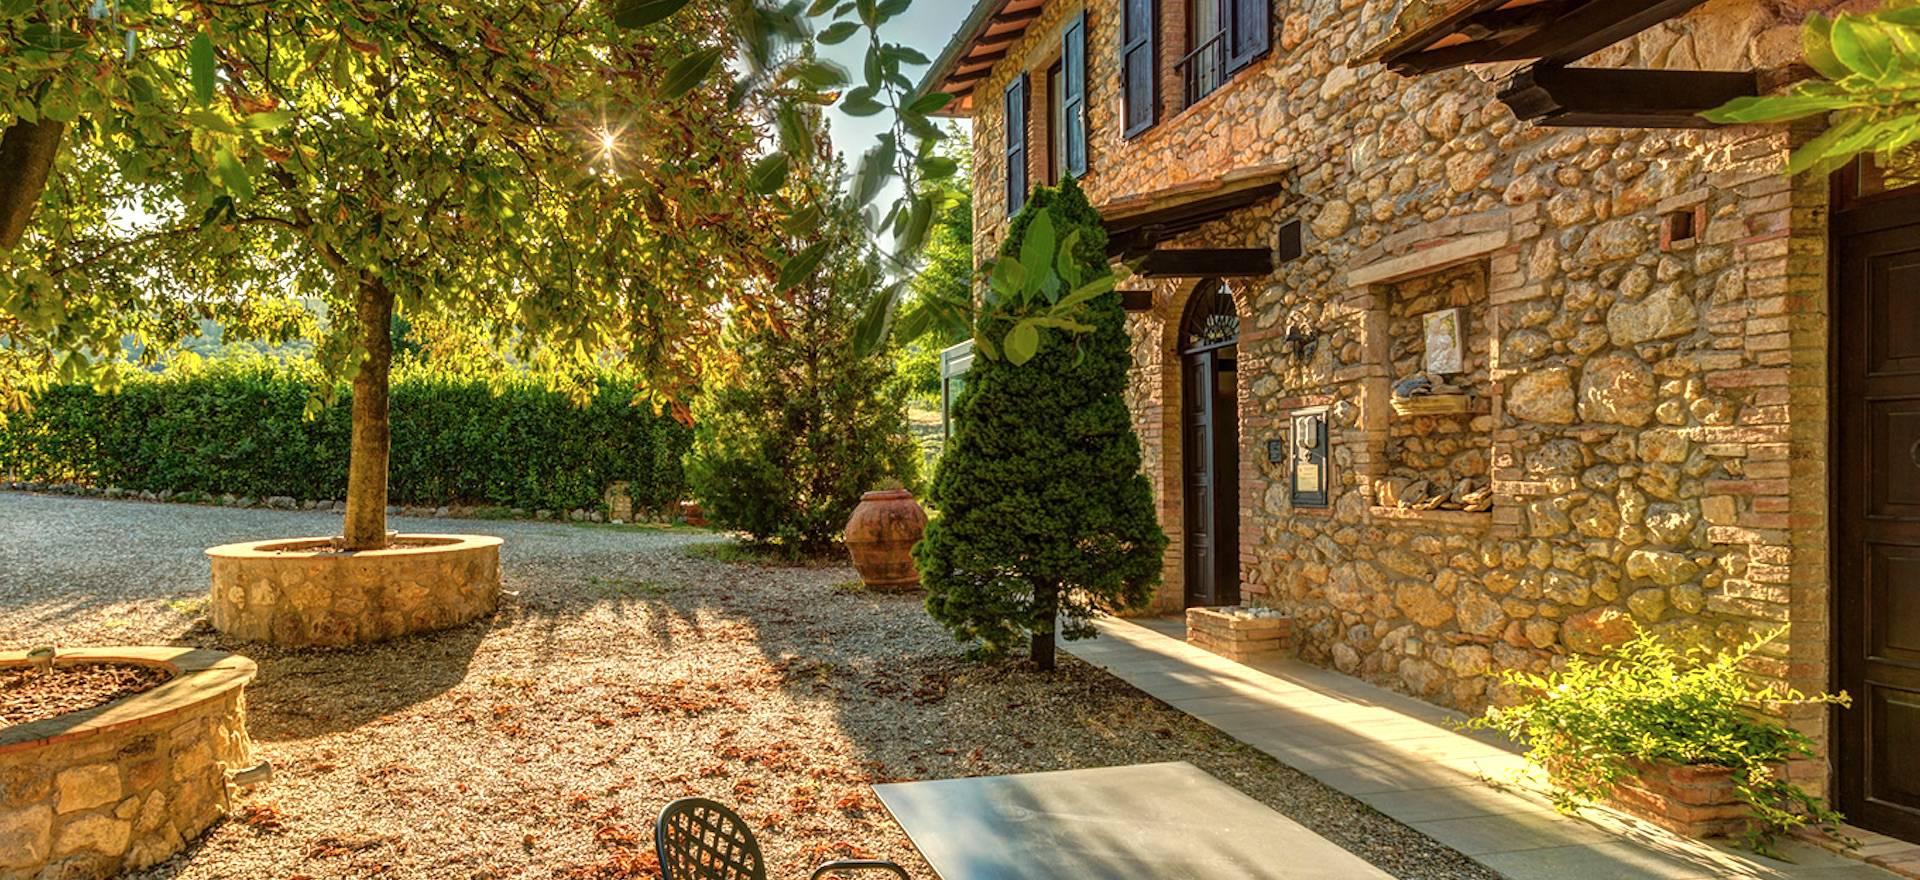 Agriturismo Toscane Agriturismo Toscane bij San Gimignano met restaurant